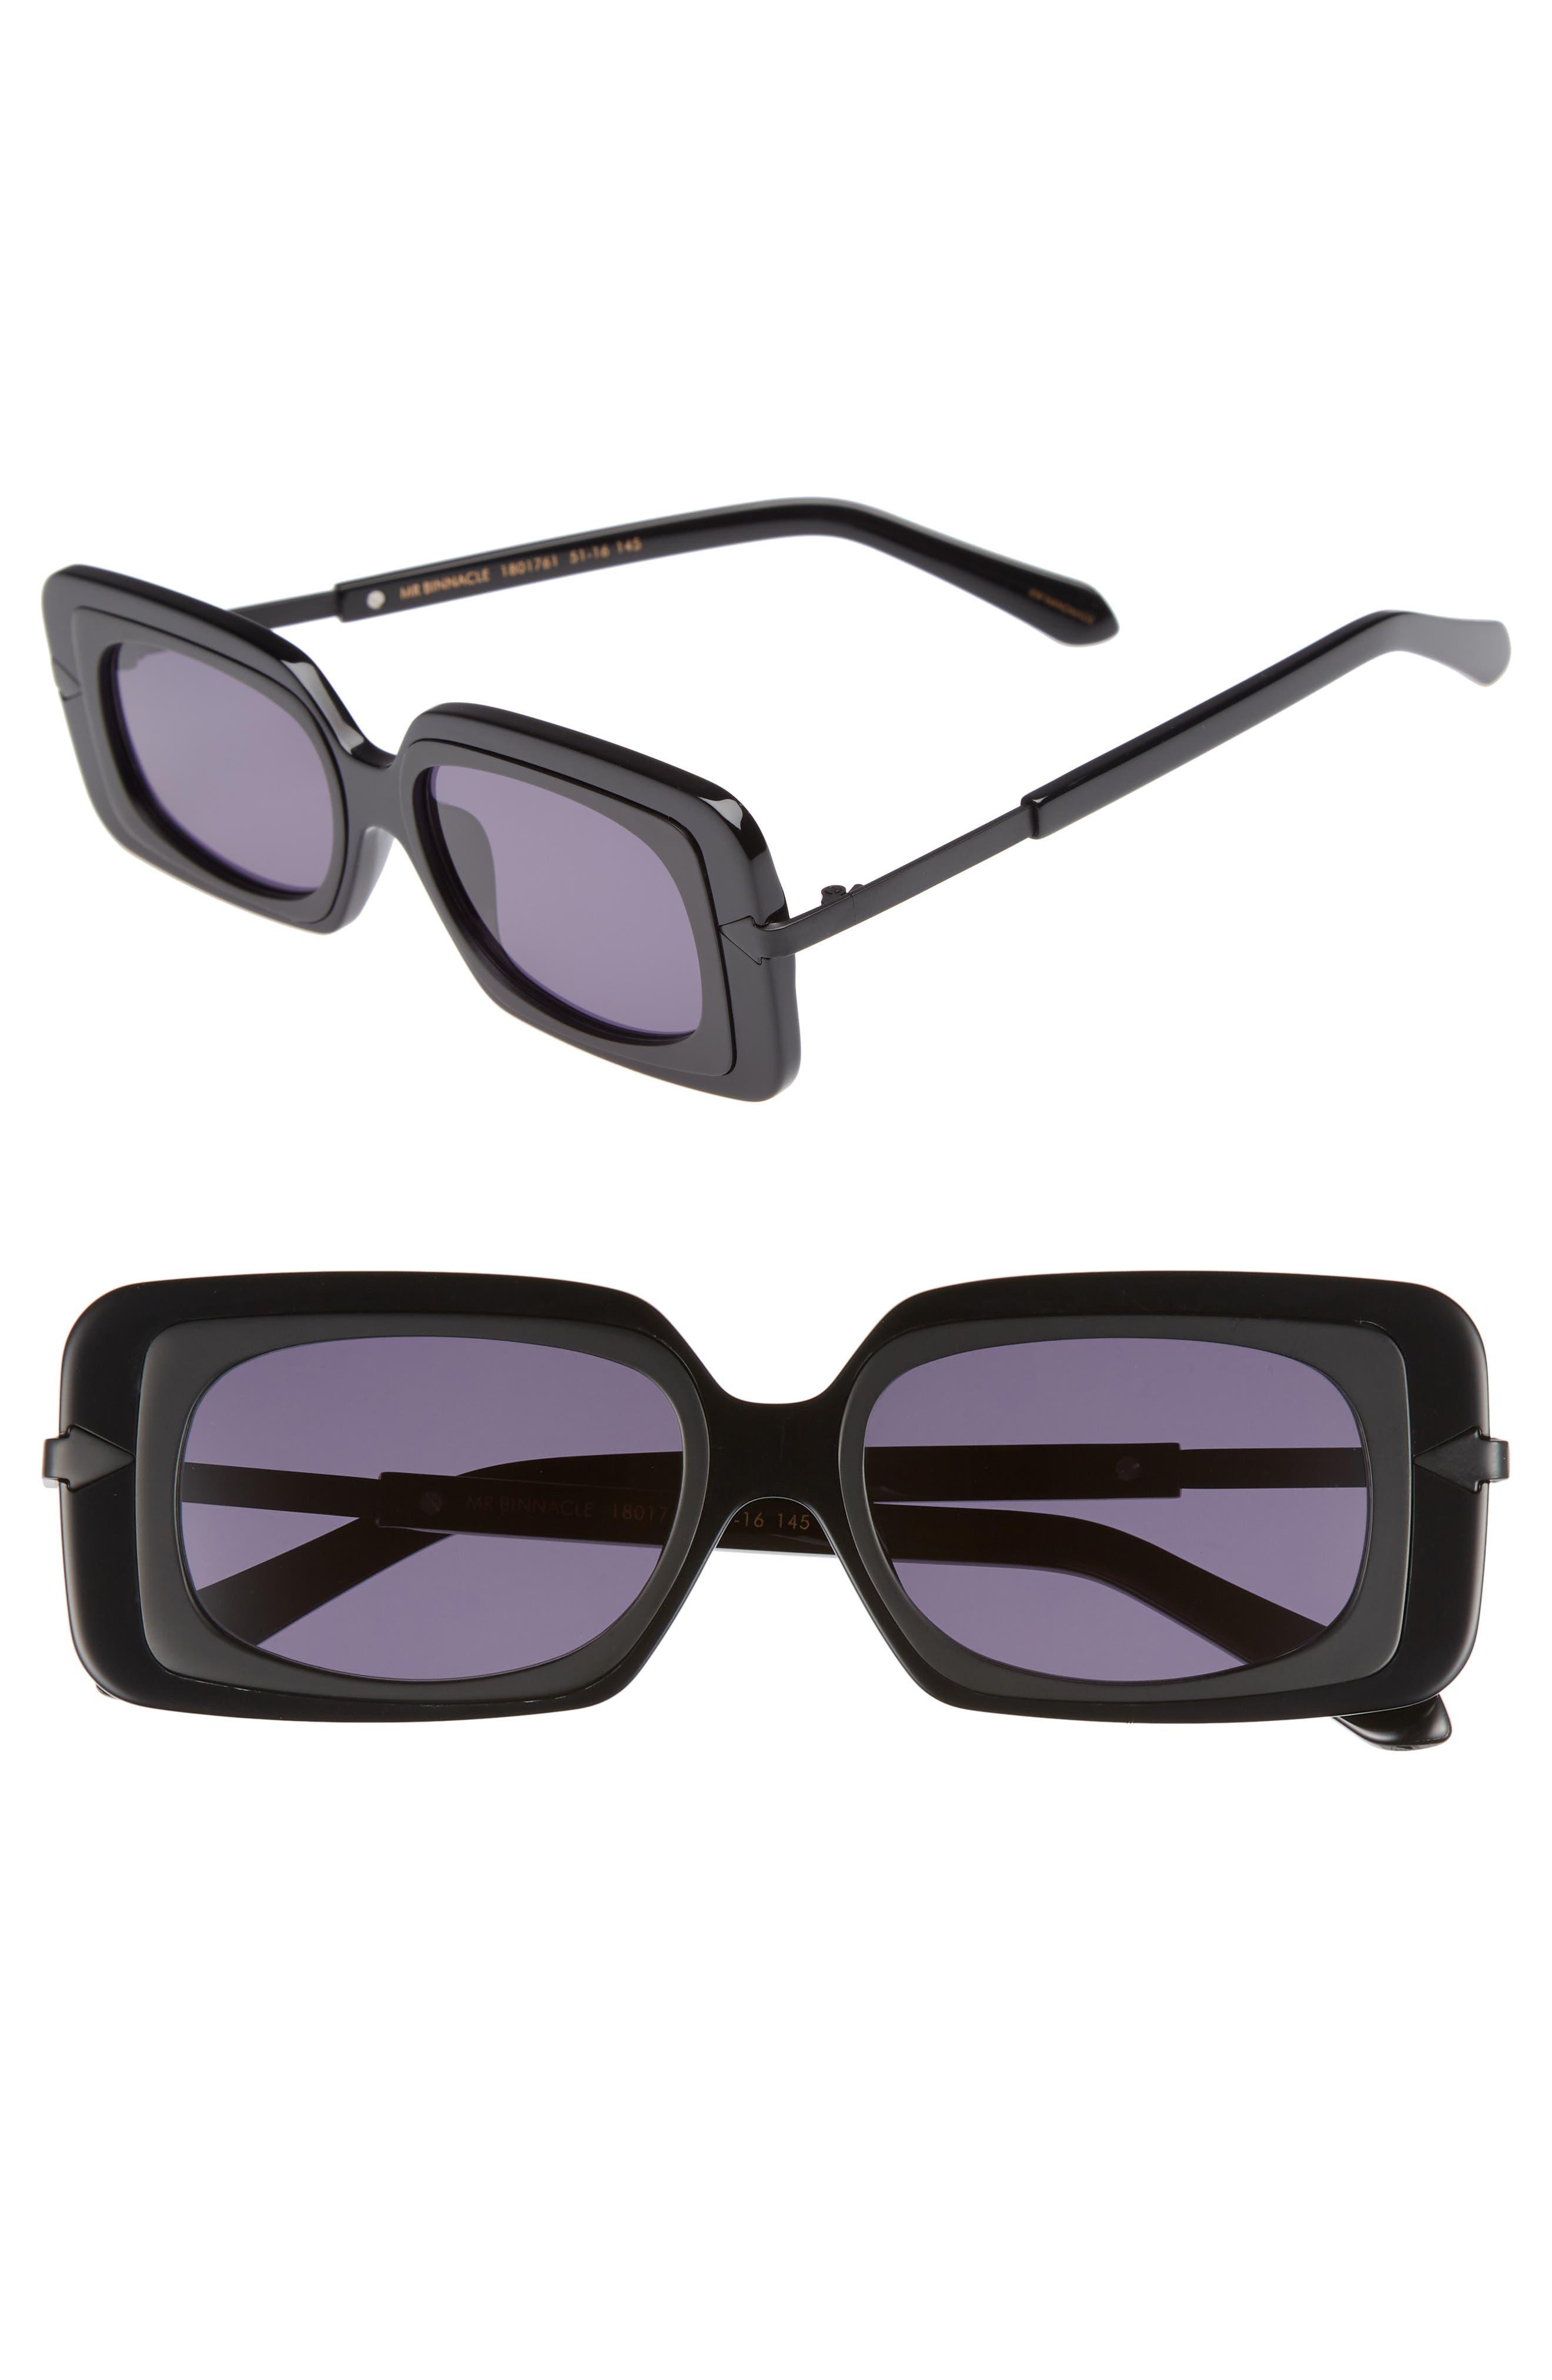 Mr. Binnacle 51mm Sunglasses,                             Main thumbnail 1, color,                             Black